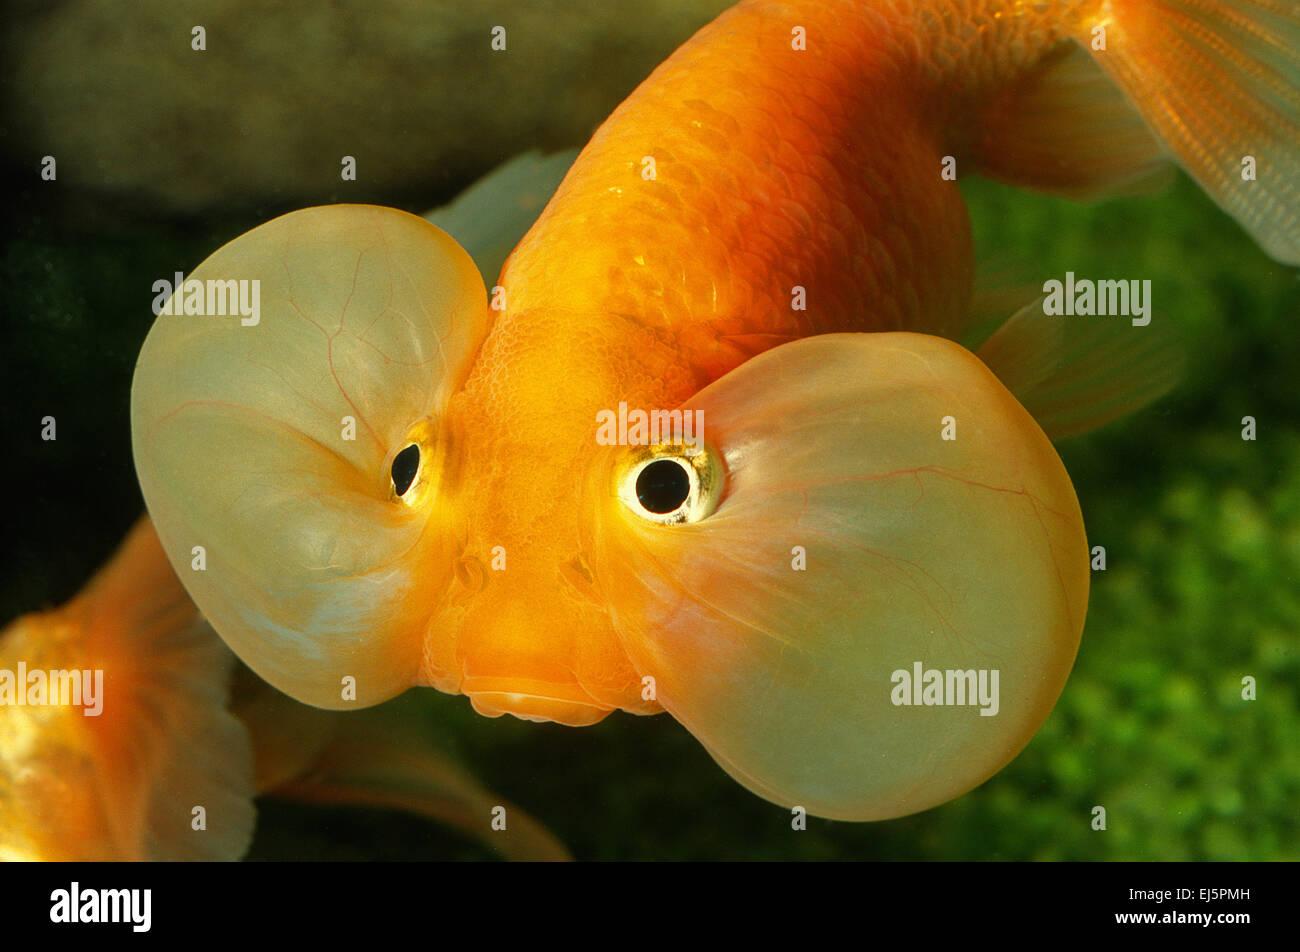 Bubble Eye Goldfish, Carassius auratus, Ciprinidae - Stock Image